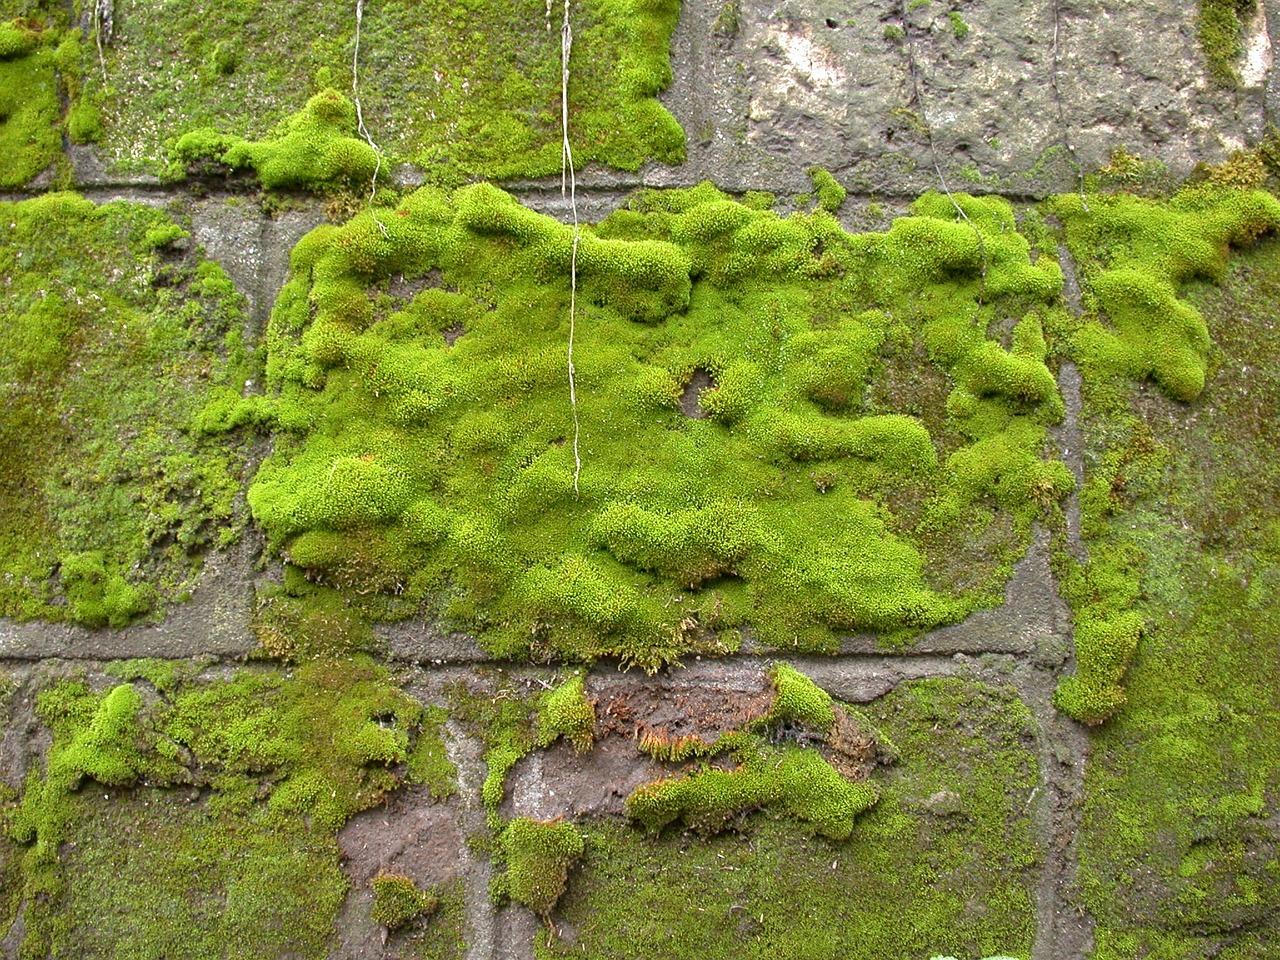 Nettoyage Dalle Piscine Javel comment nettoyer une façade des salissures, pollution